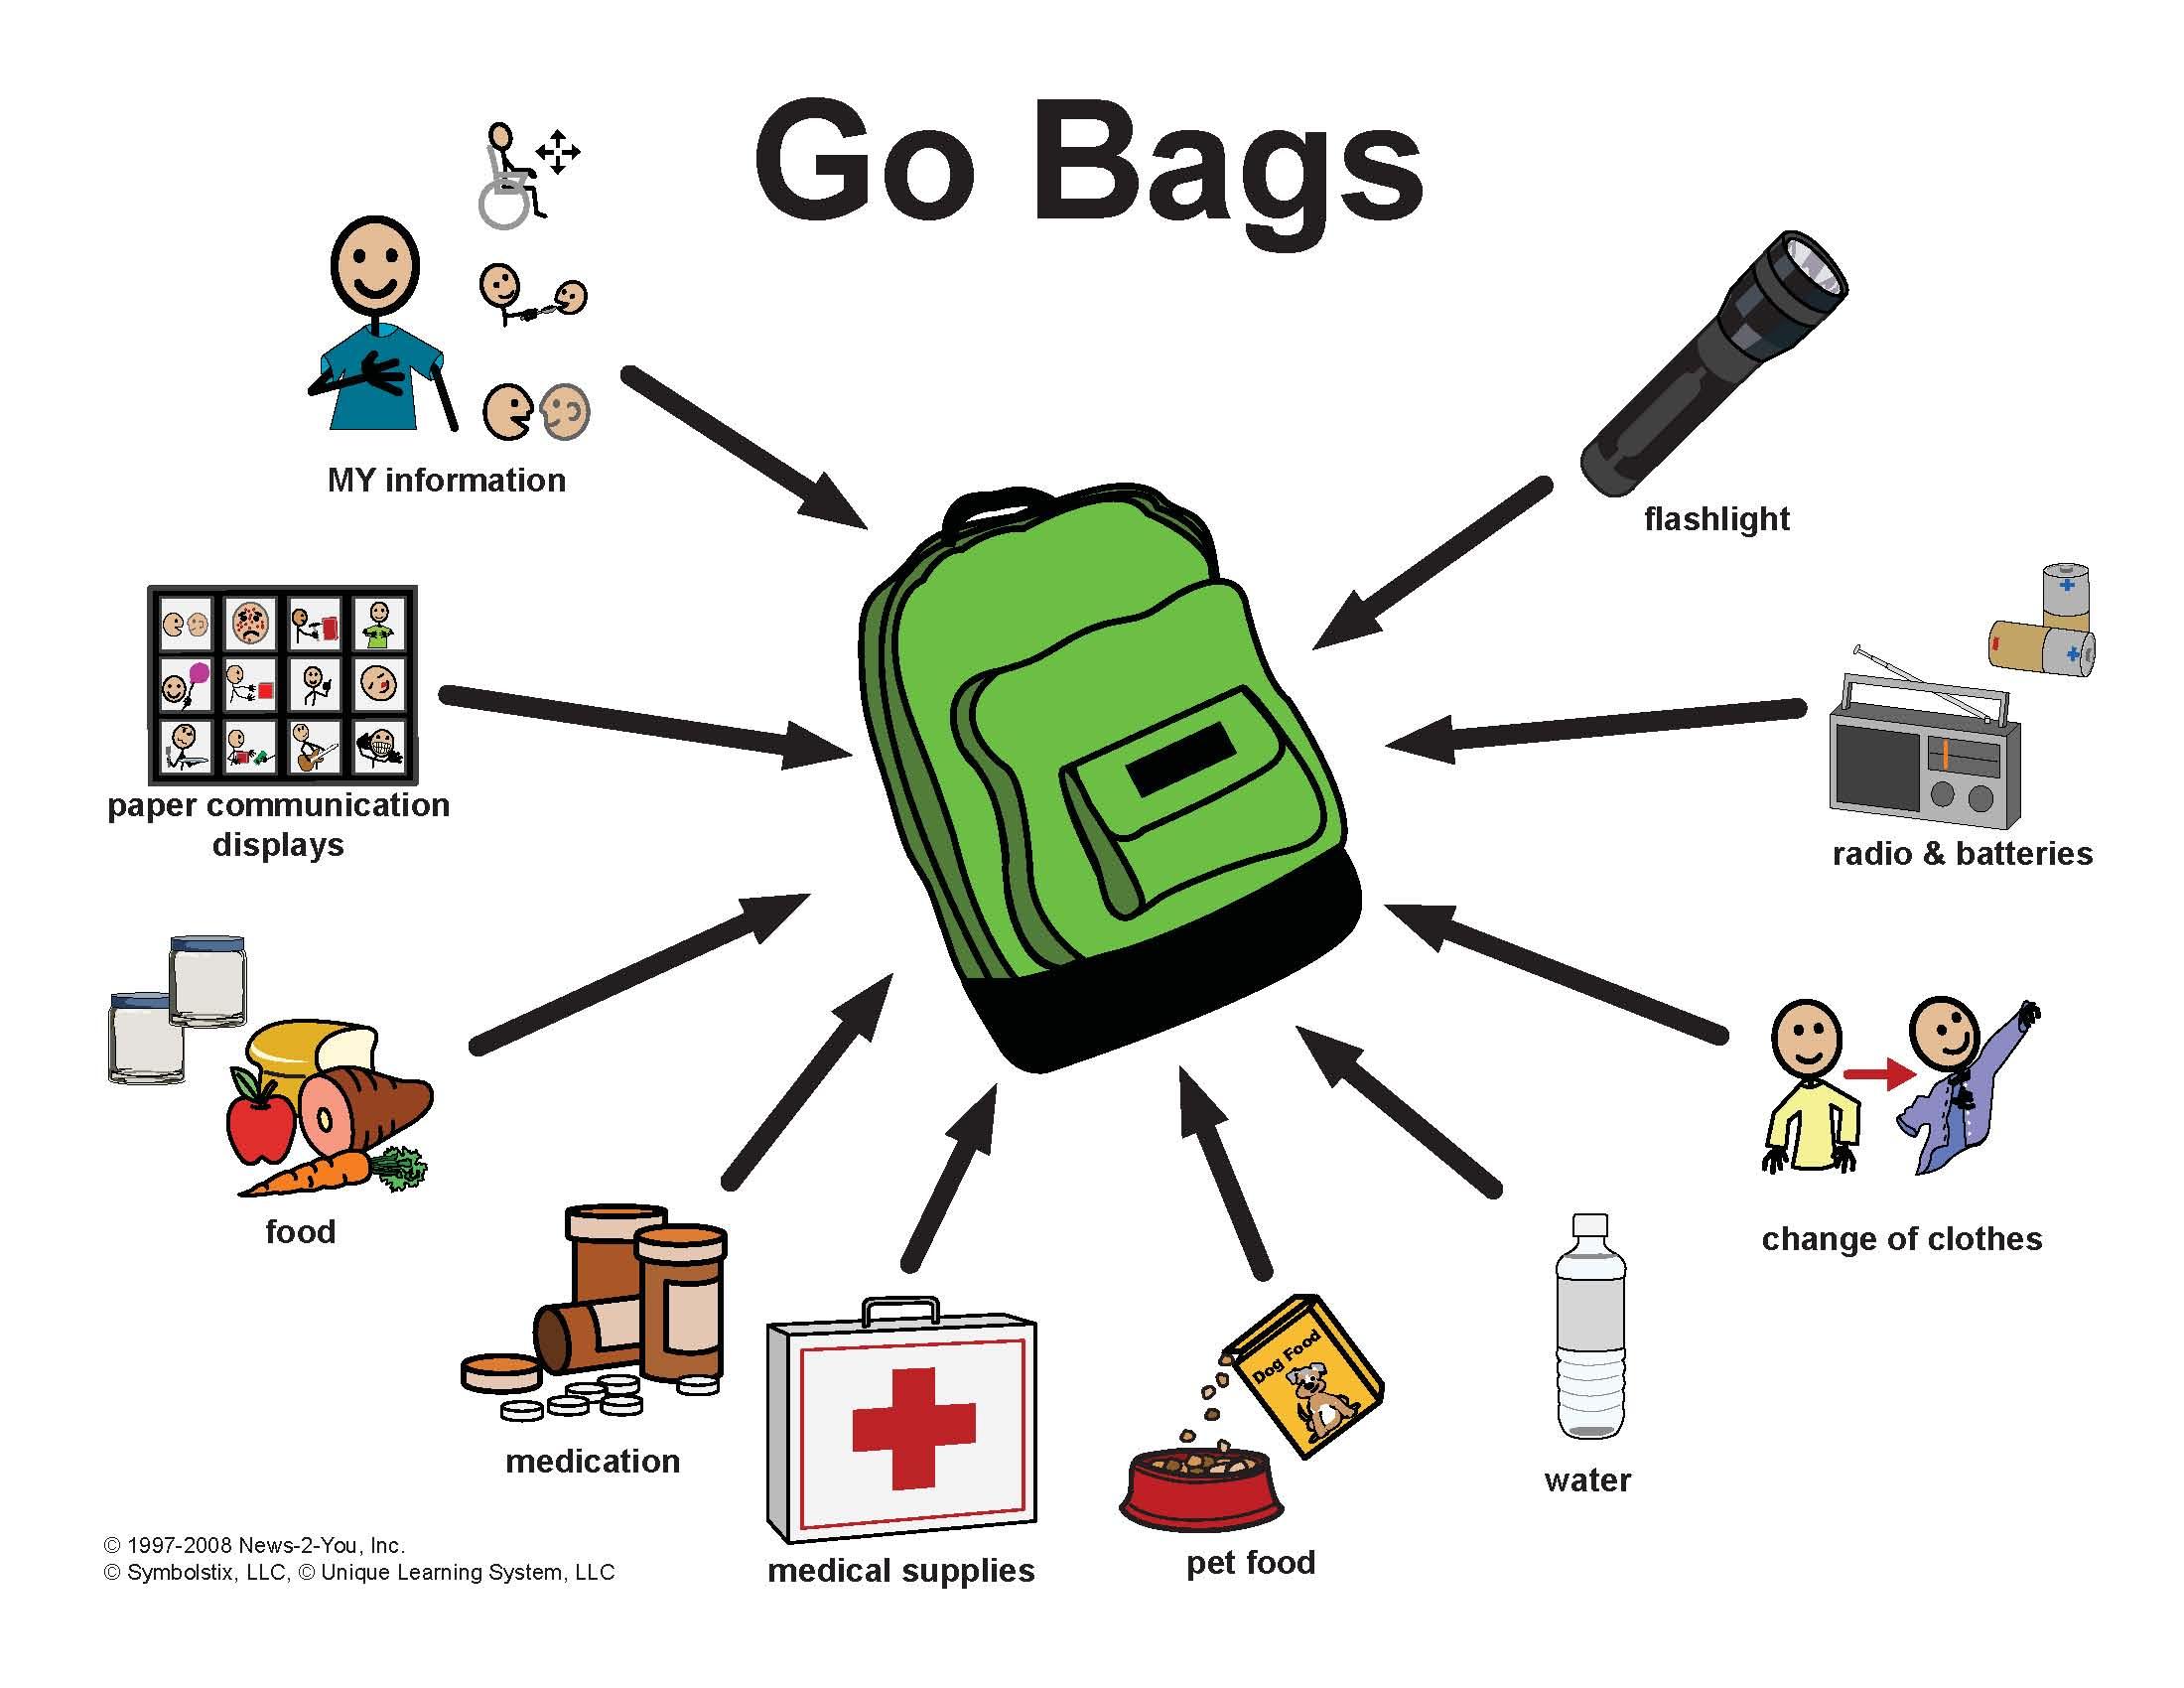 Emergency go bag packing list template